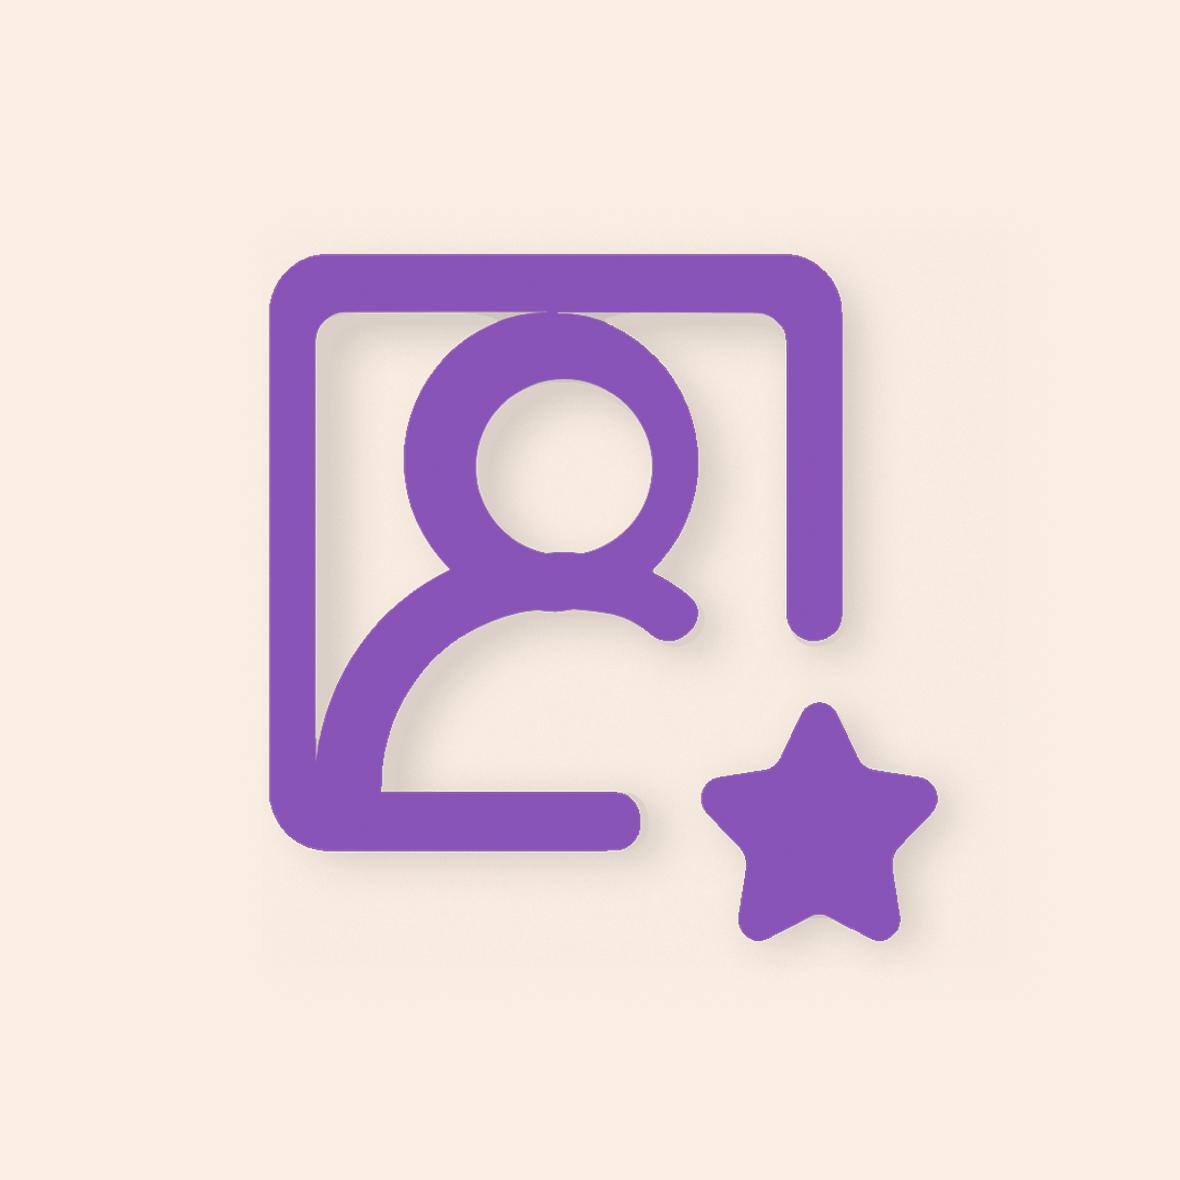 LoopClub Recommendation Kit